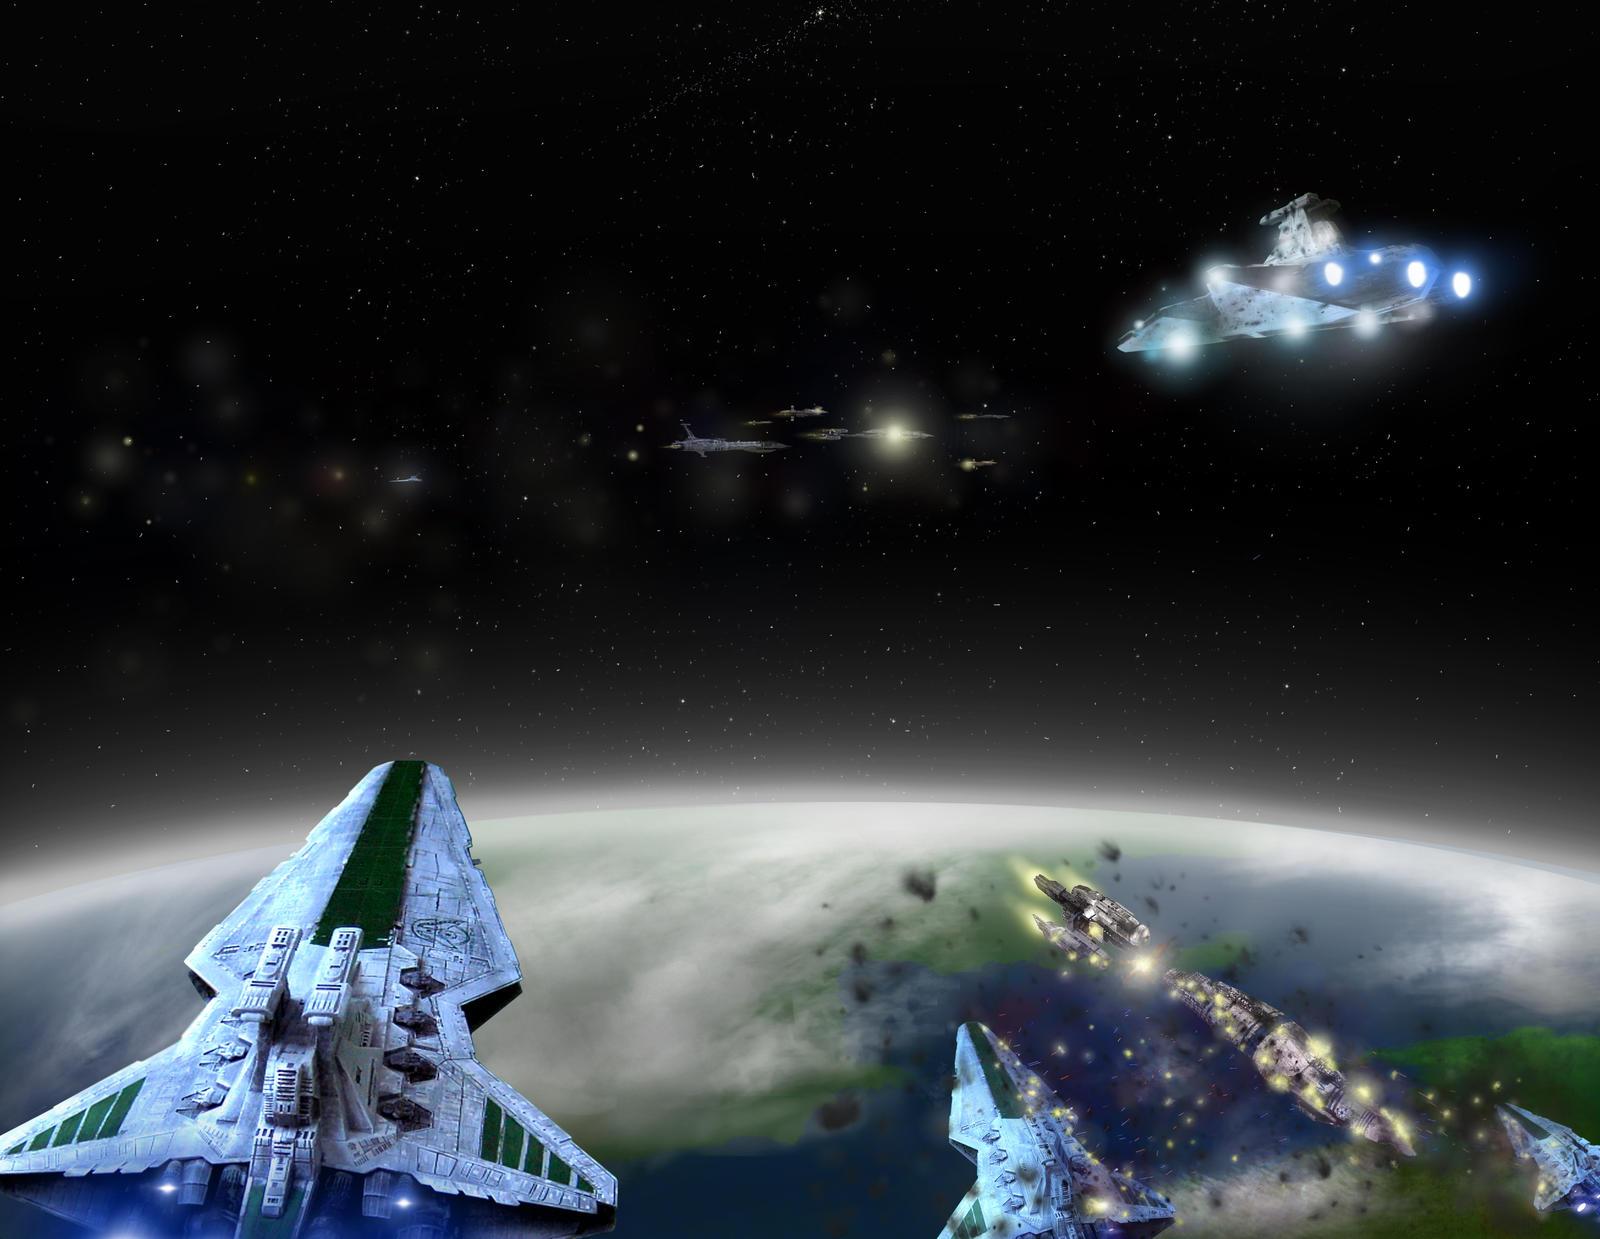 star wars space battle image